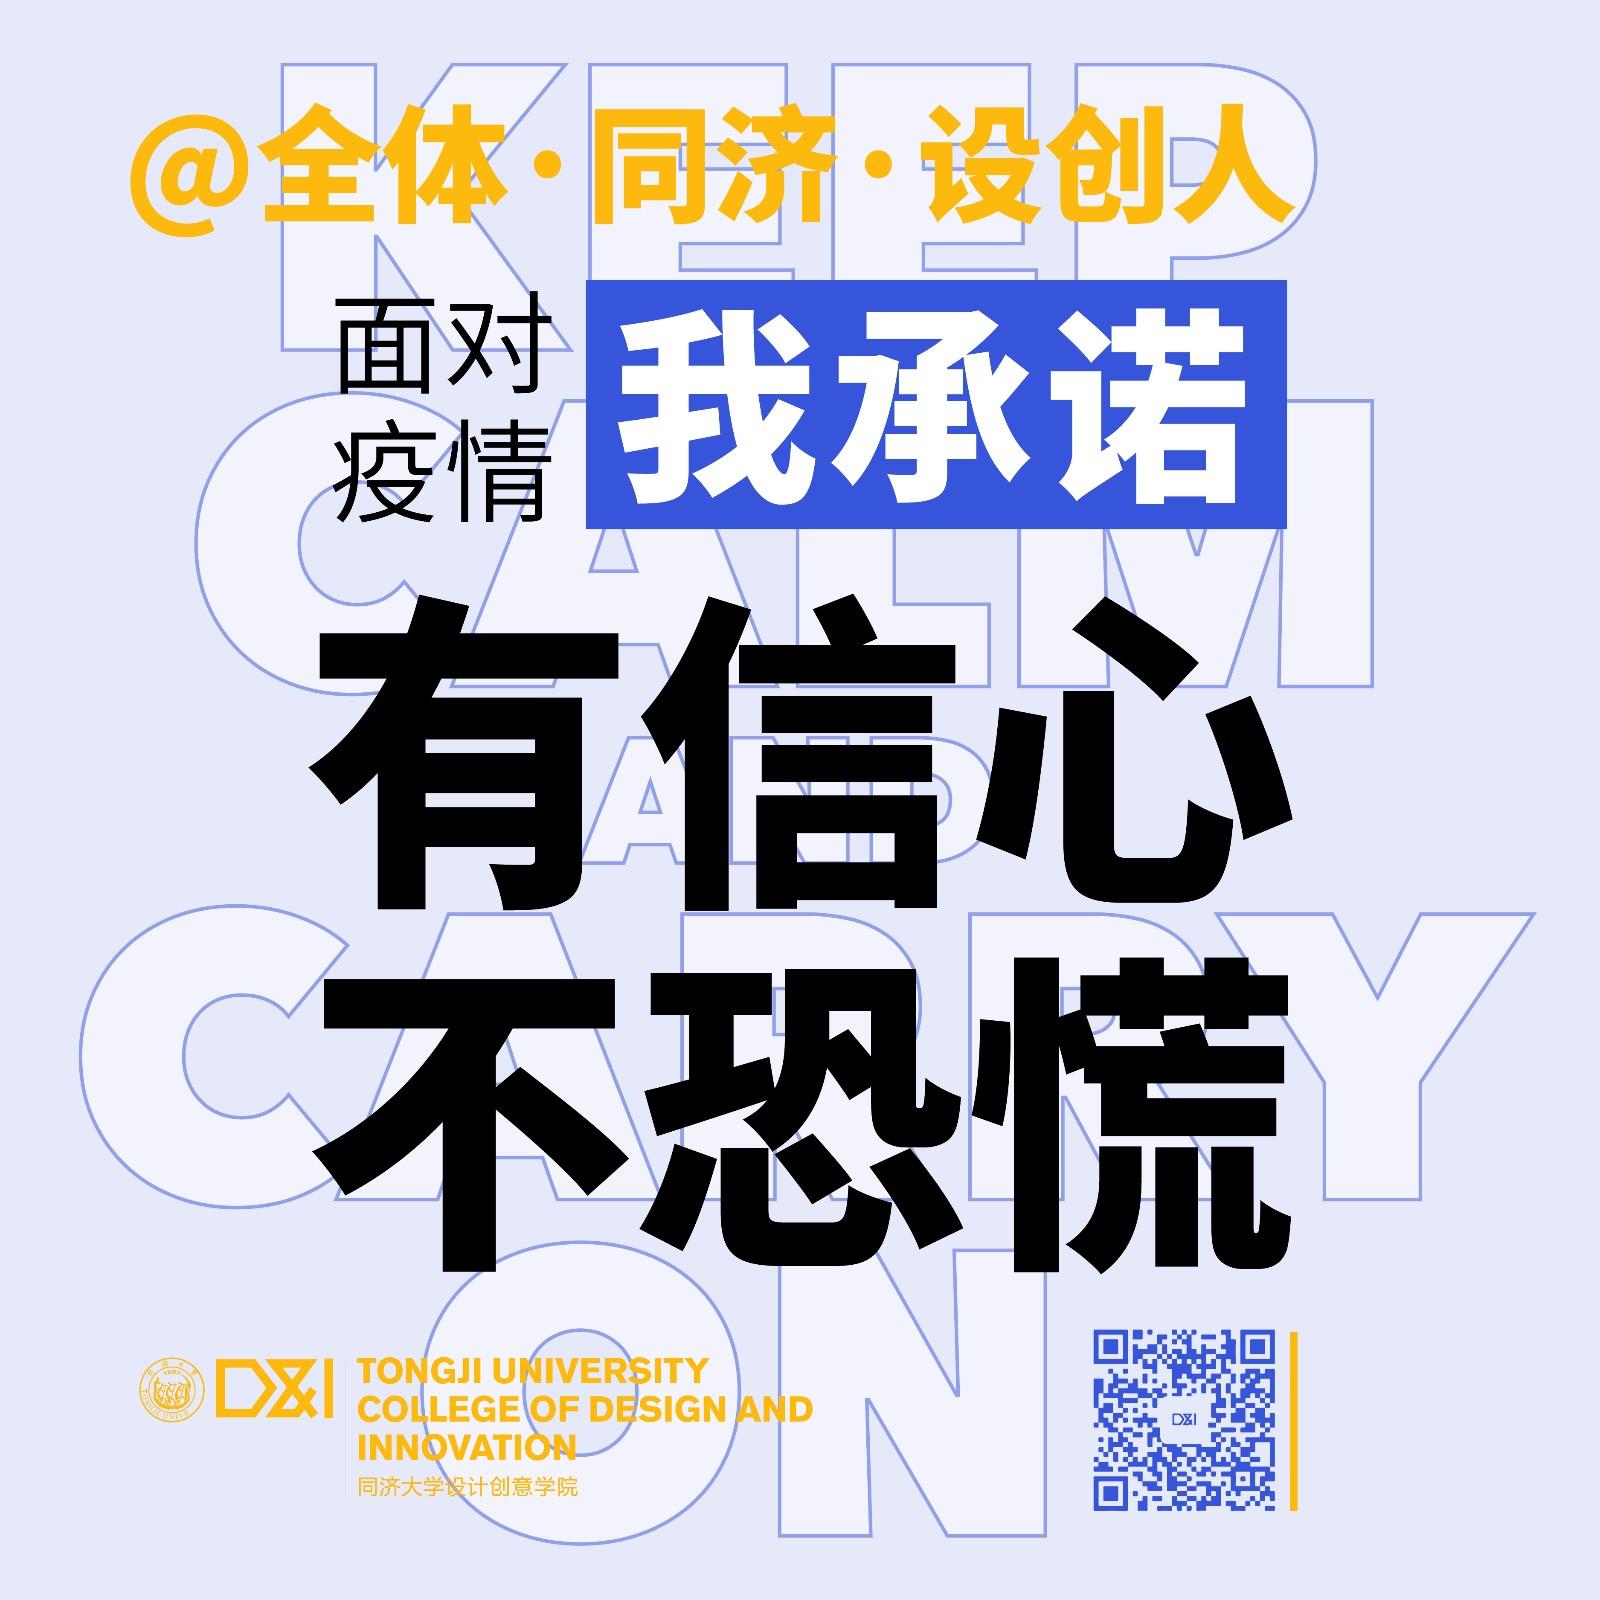 pic_画板 1 副本 8.jpg